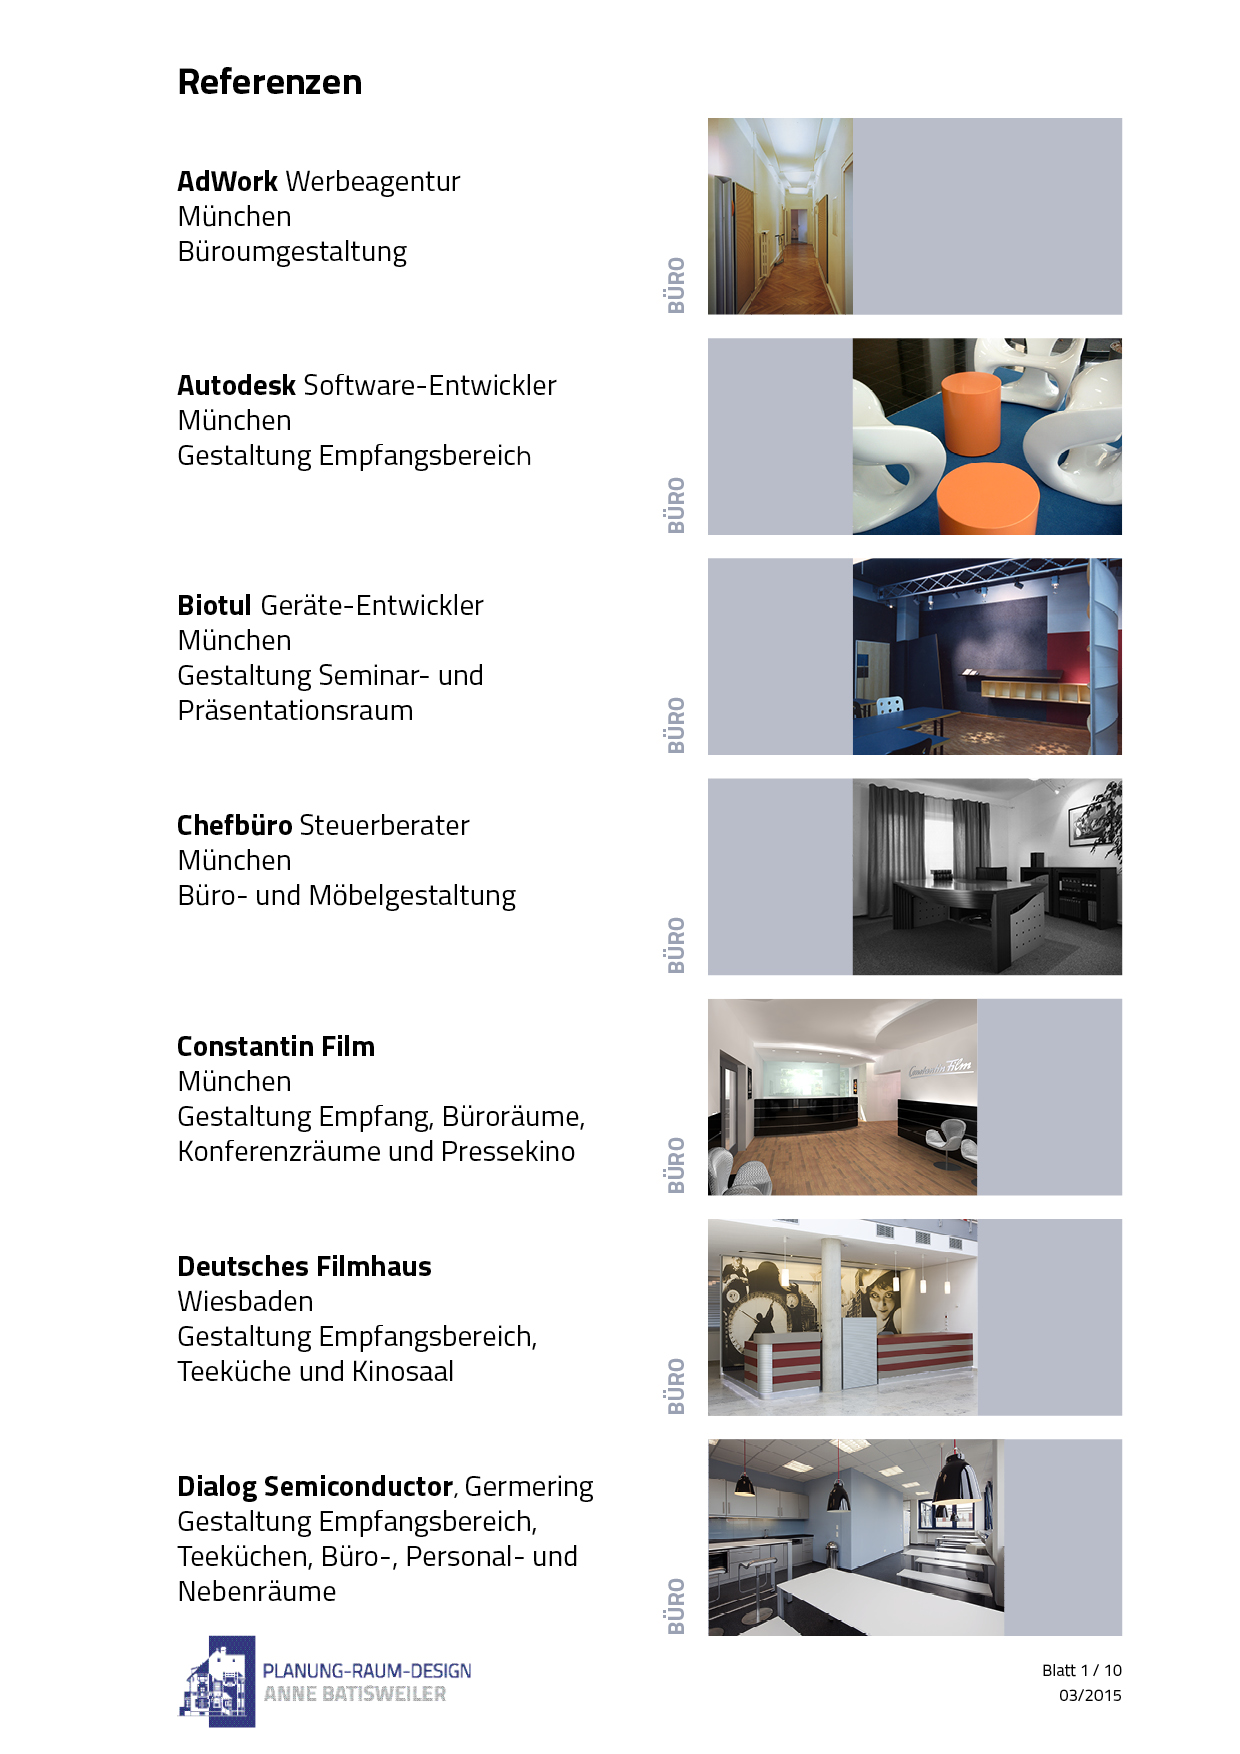 innenarchitekten ranking industriefotografie fotografie. Black Bedroom Furniture Sets. Home Design Ideas